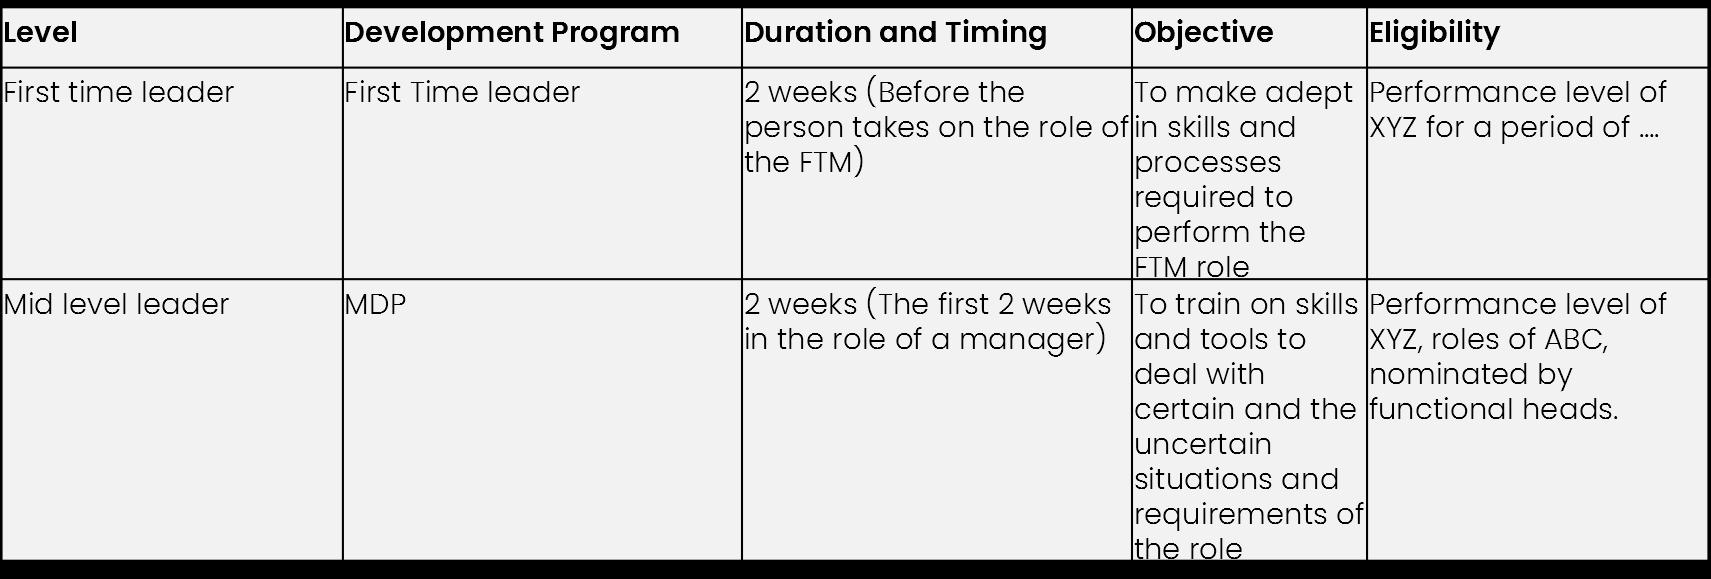 Management Development Programs Table